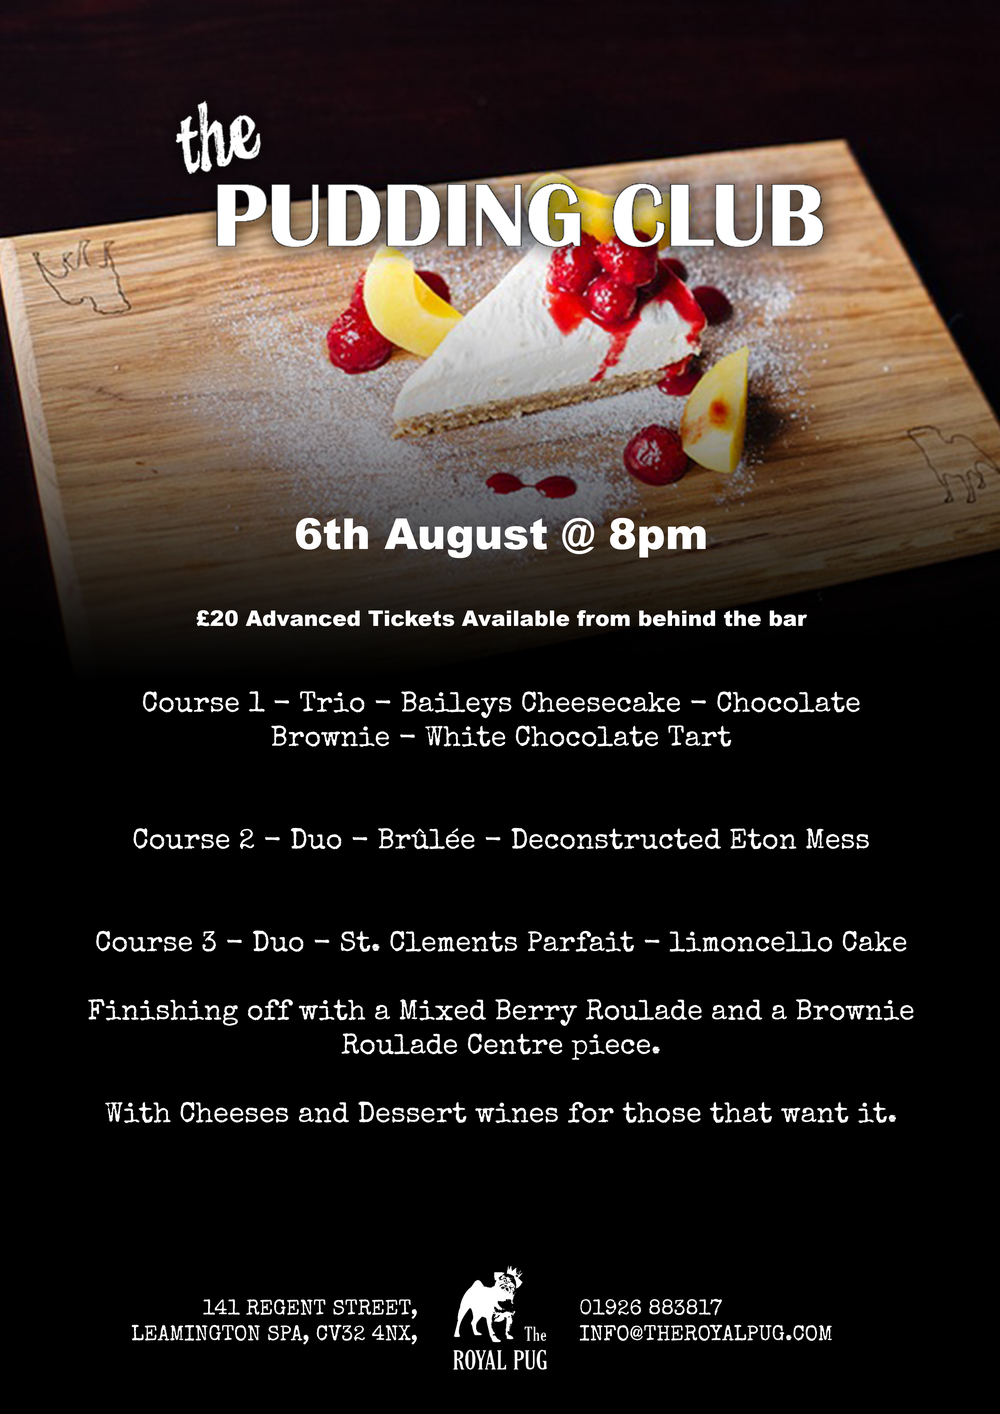 The_Pudding_Club_The_Royal_Pug.jpg